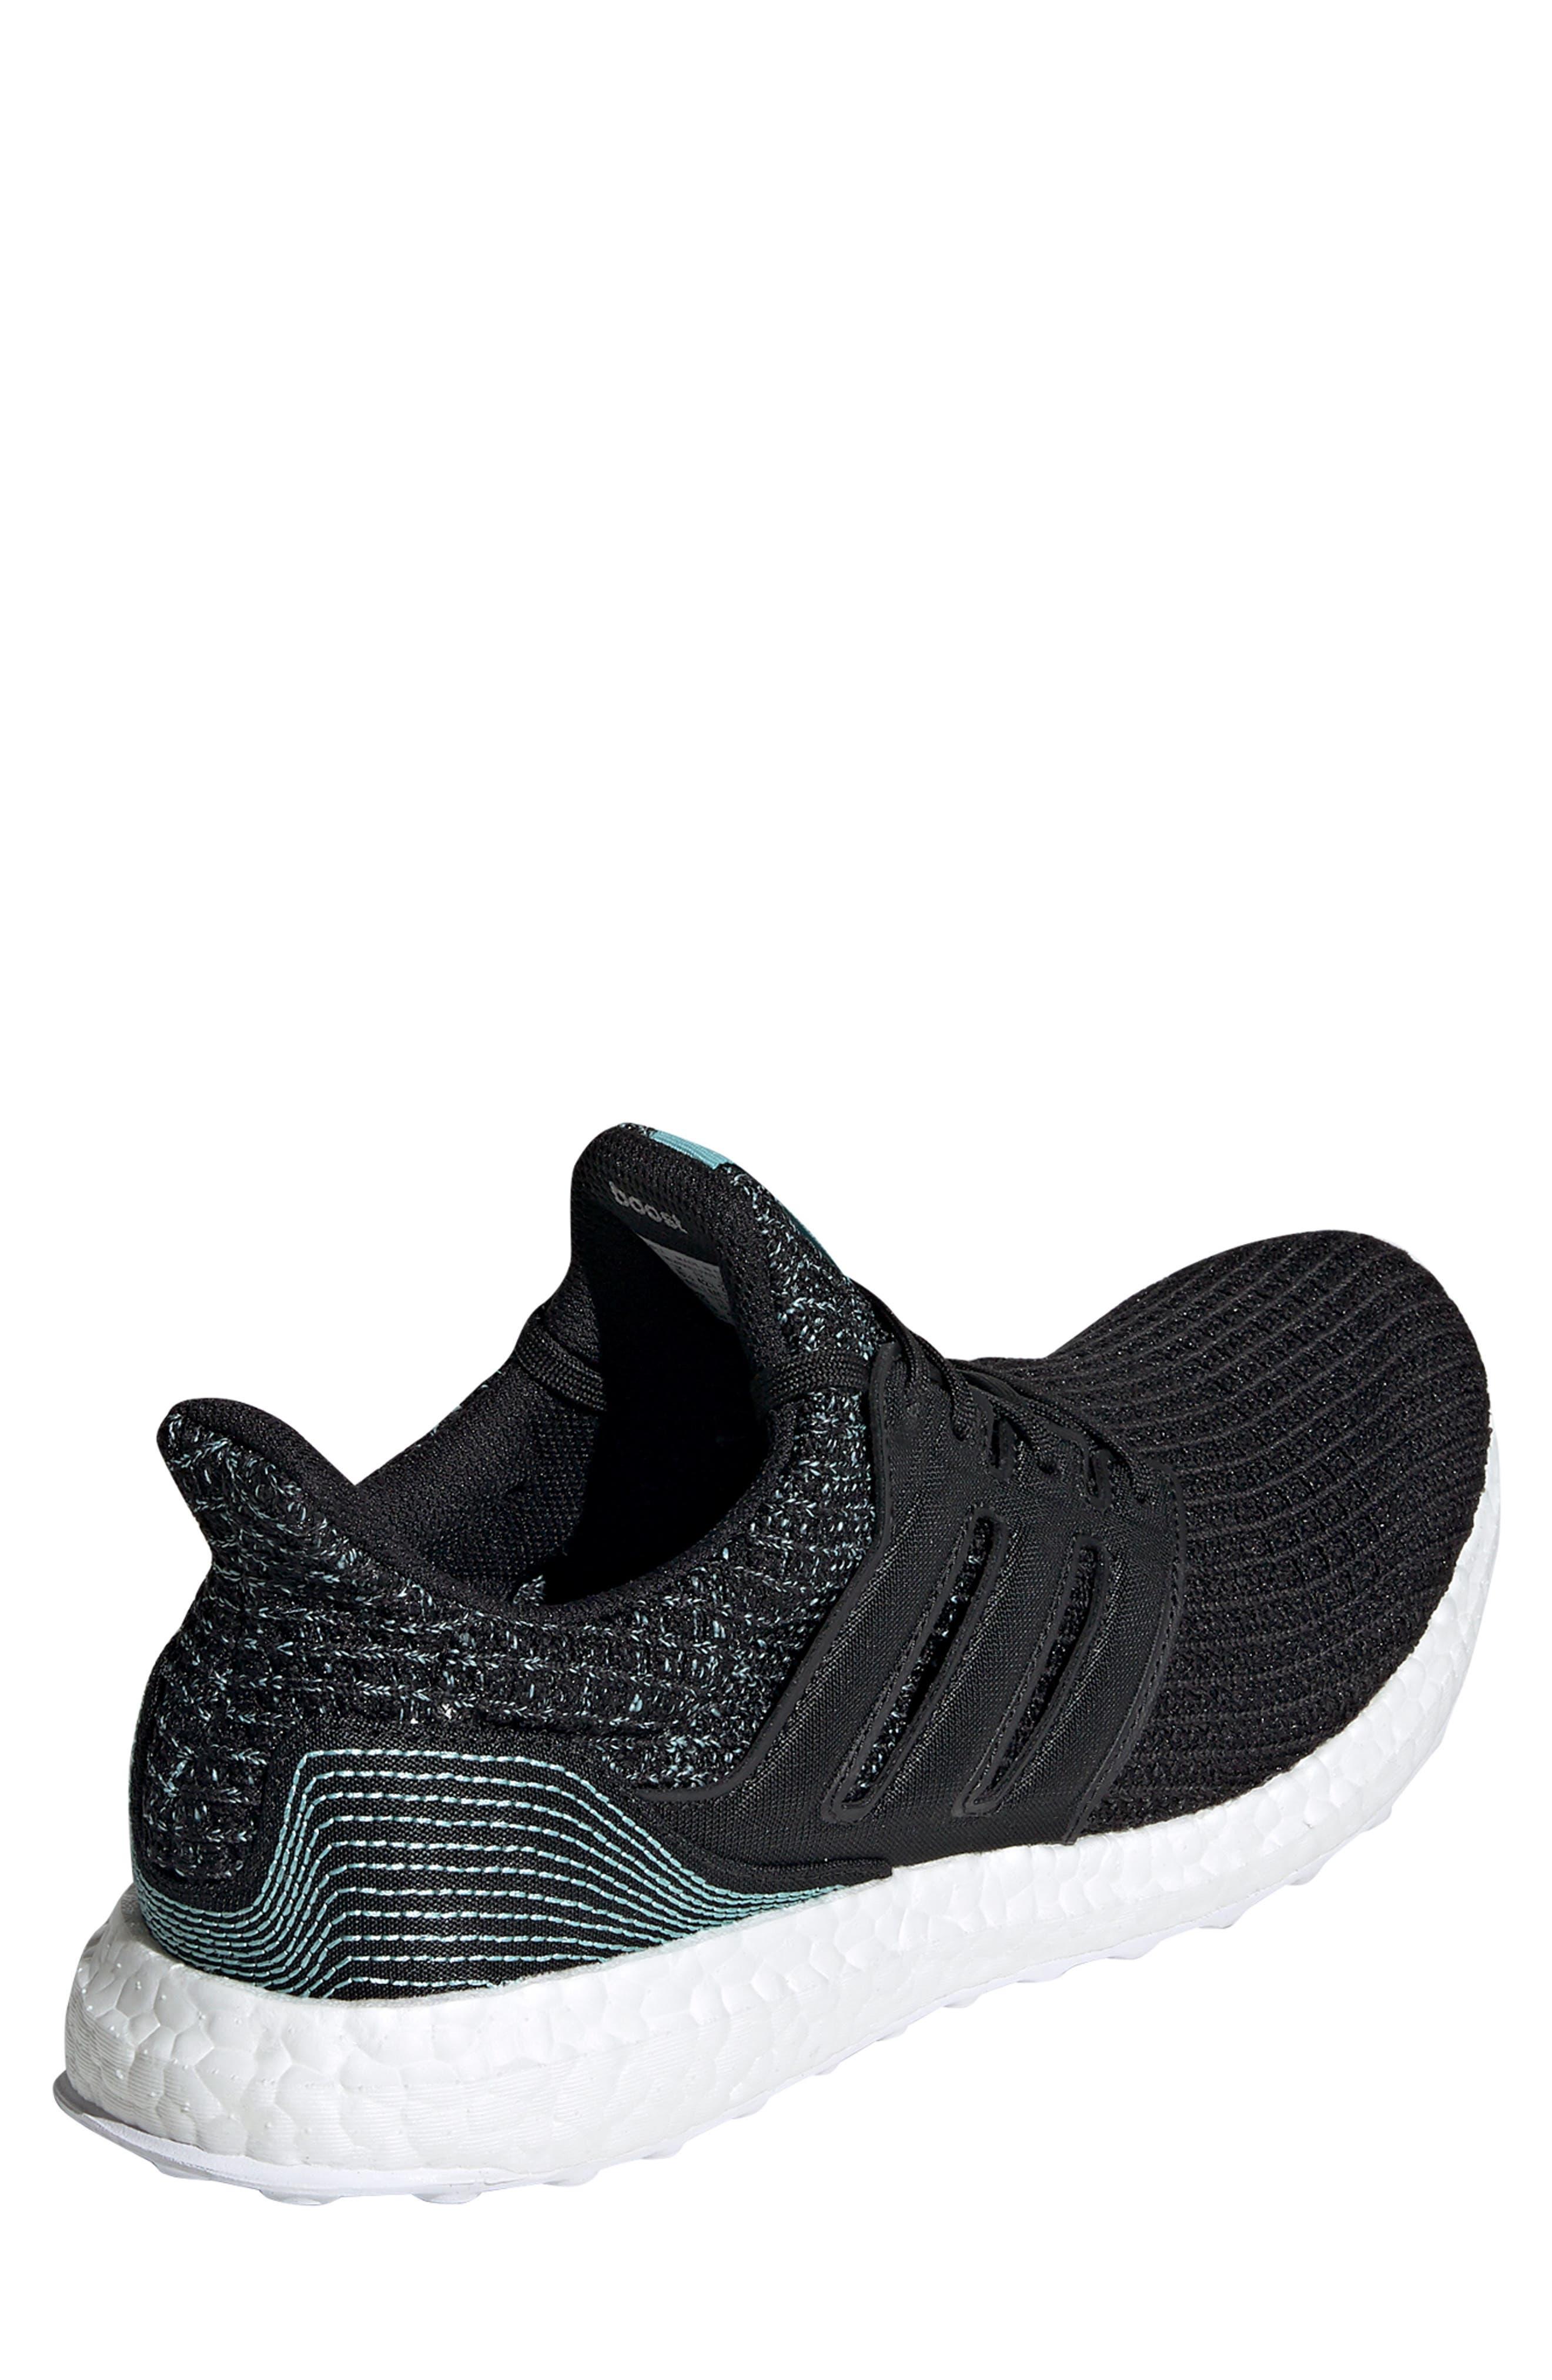 Parley UltraBoost Sneaker,                             Alternate thumbnail 2, color,                             001